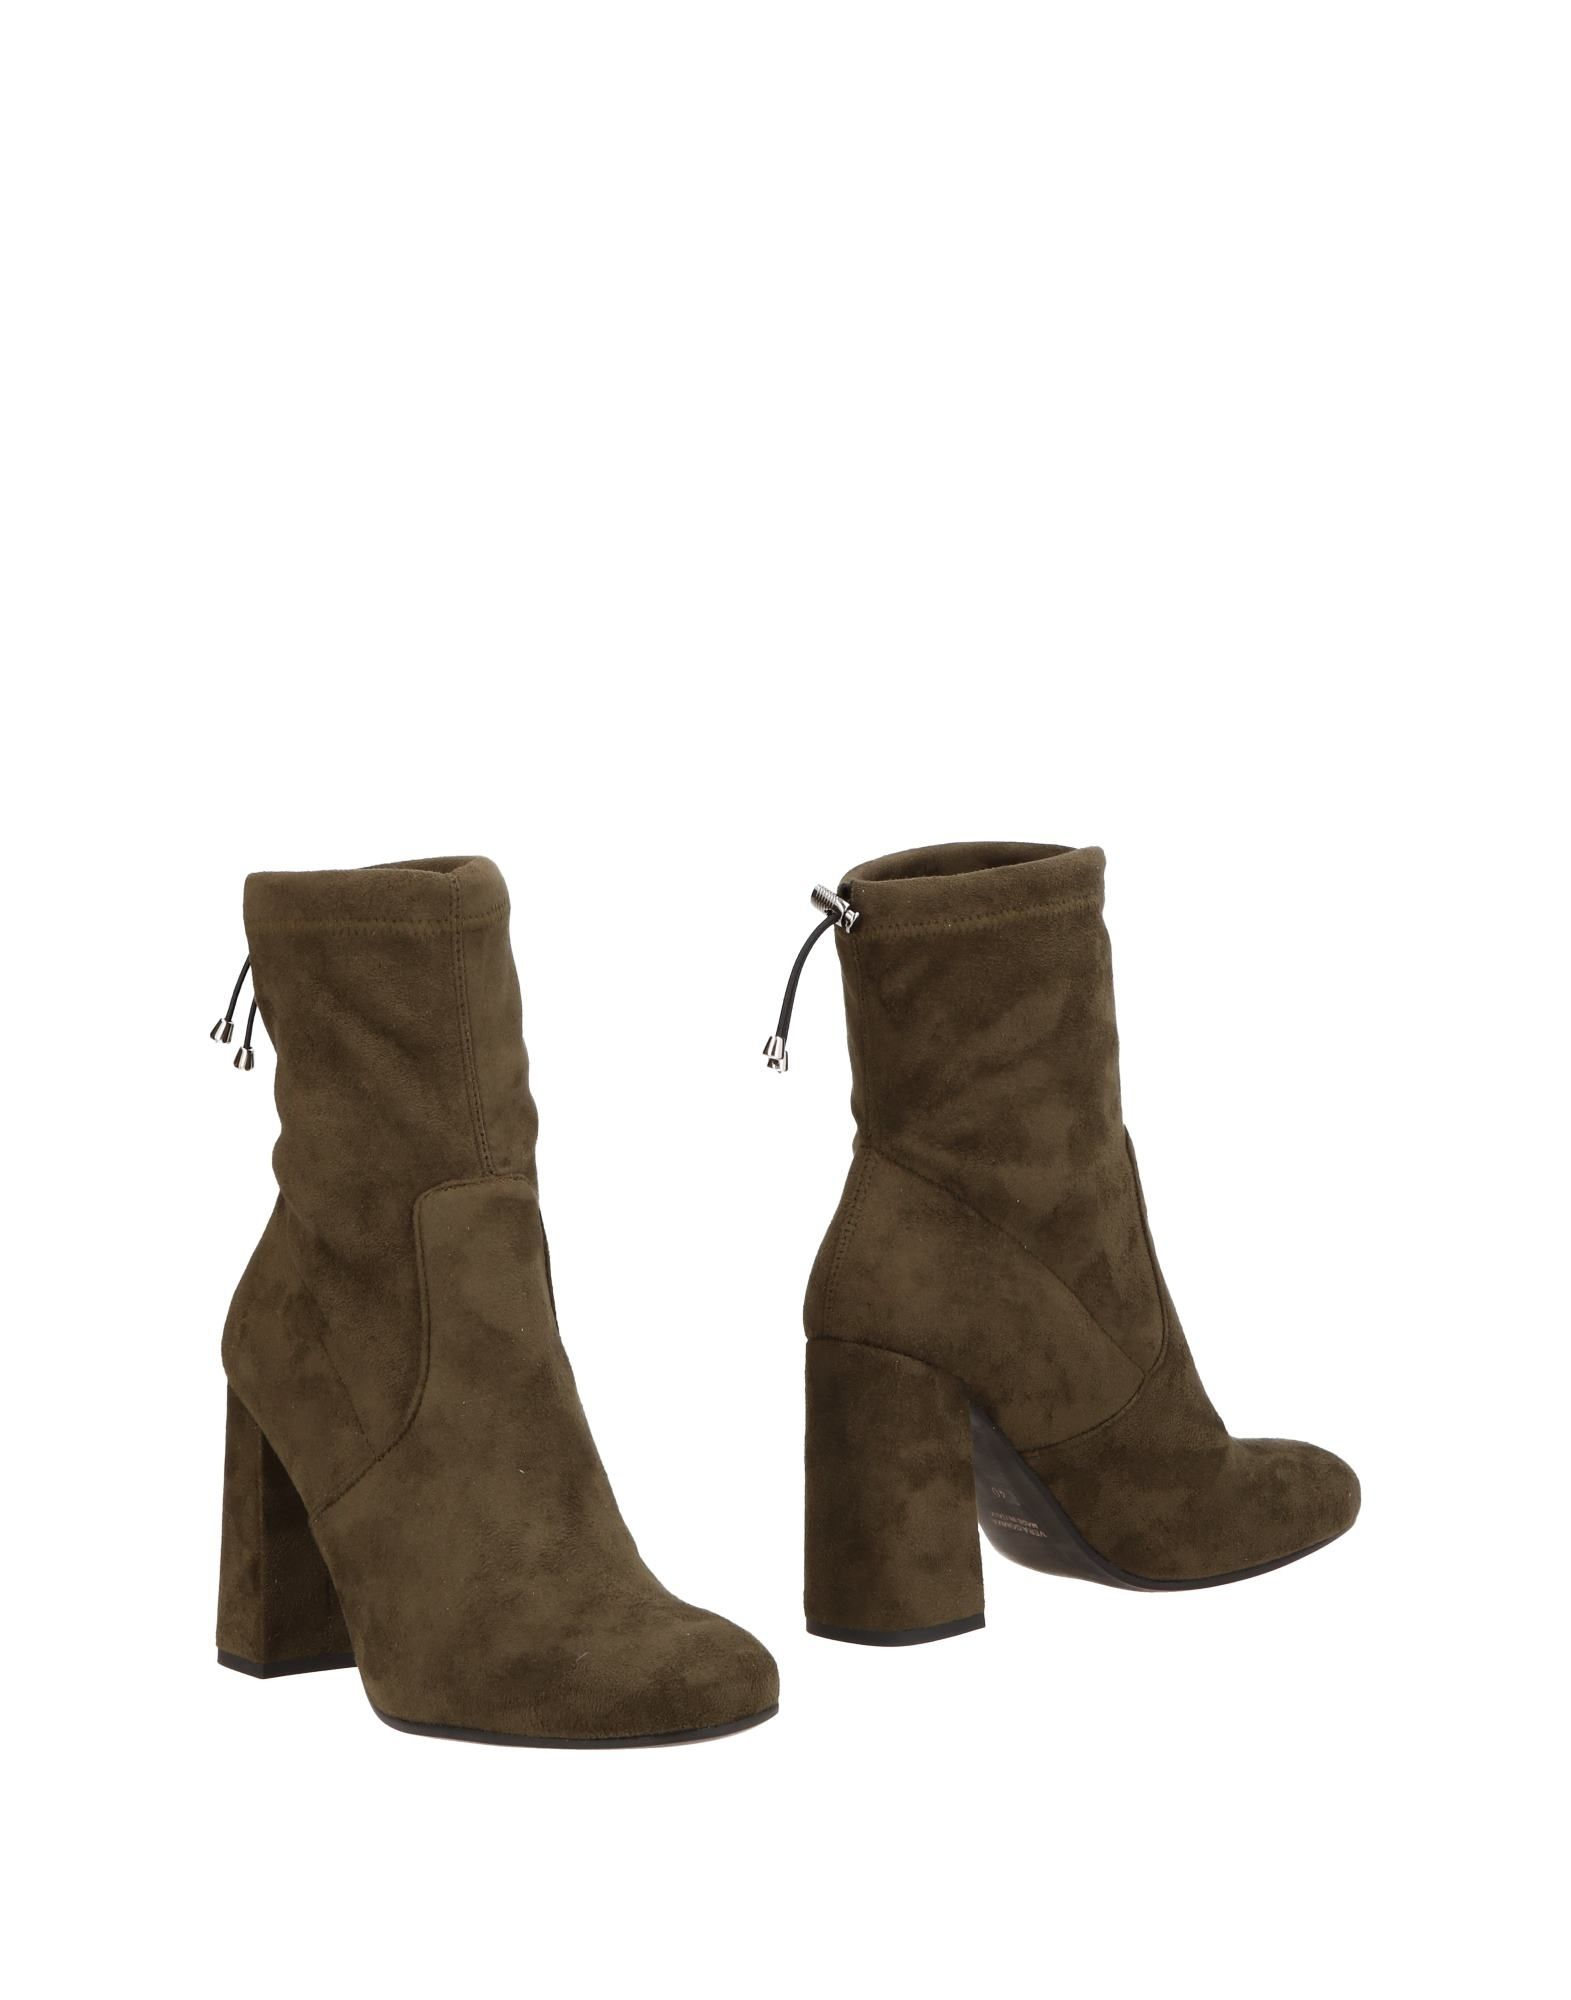 Chiarini Bologna Gute Stiefelette Damen  11497119CL Gute Bologna Qualität beliebte Schuhe 23f840